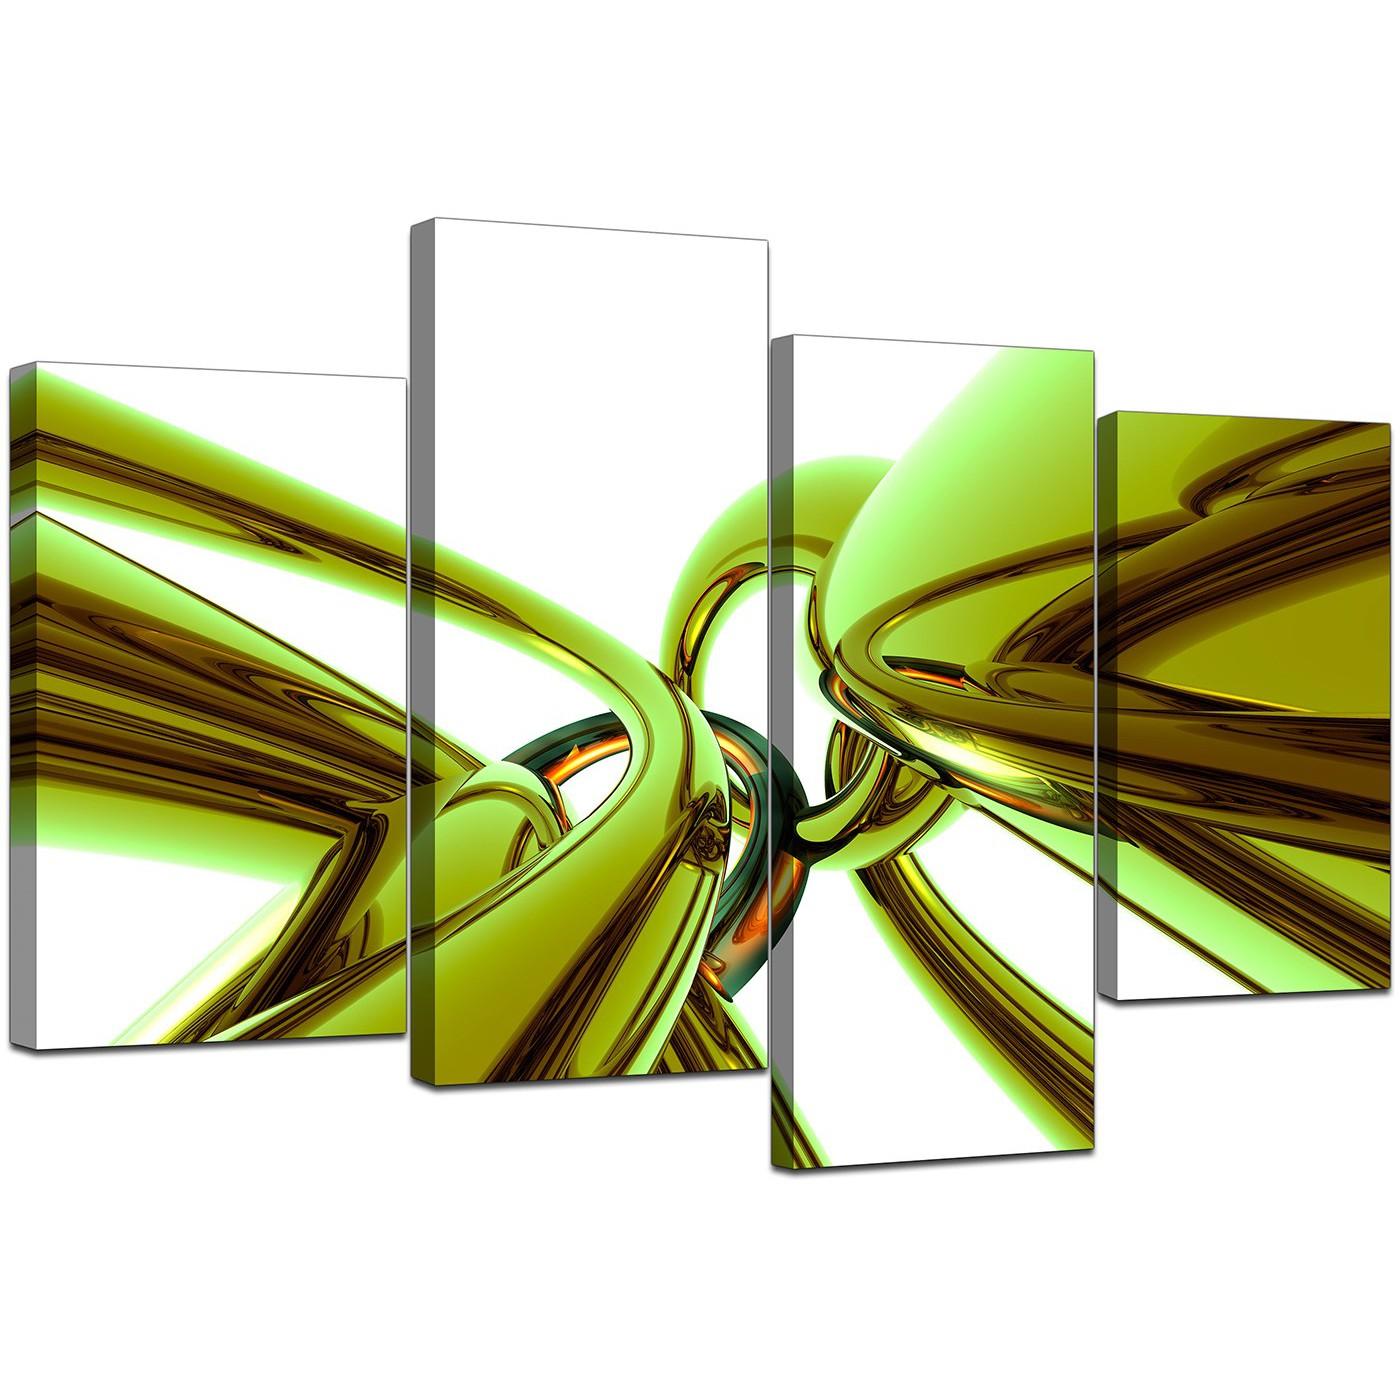 Amazing Display Gallery Item 5; Set Of Four Living Room Lime Green Canvas Art  Display Gallery Item 6